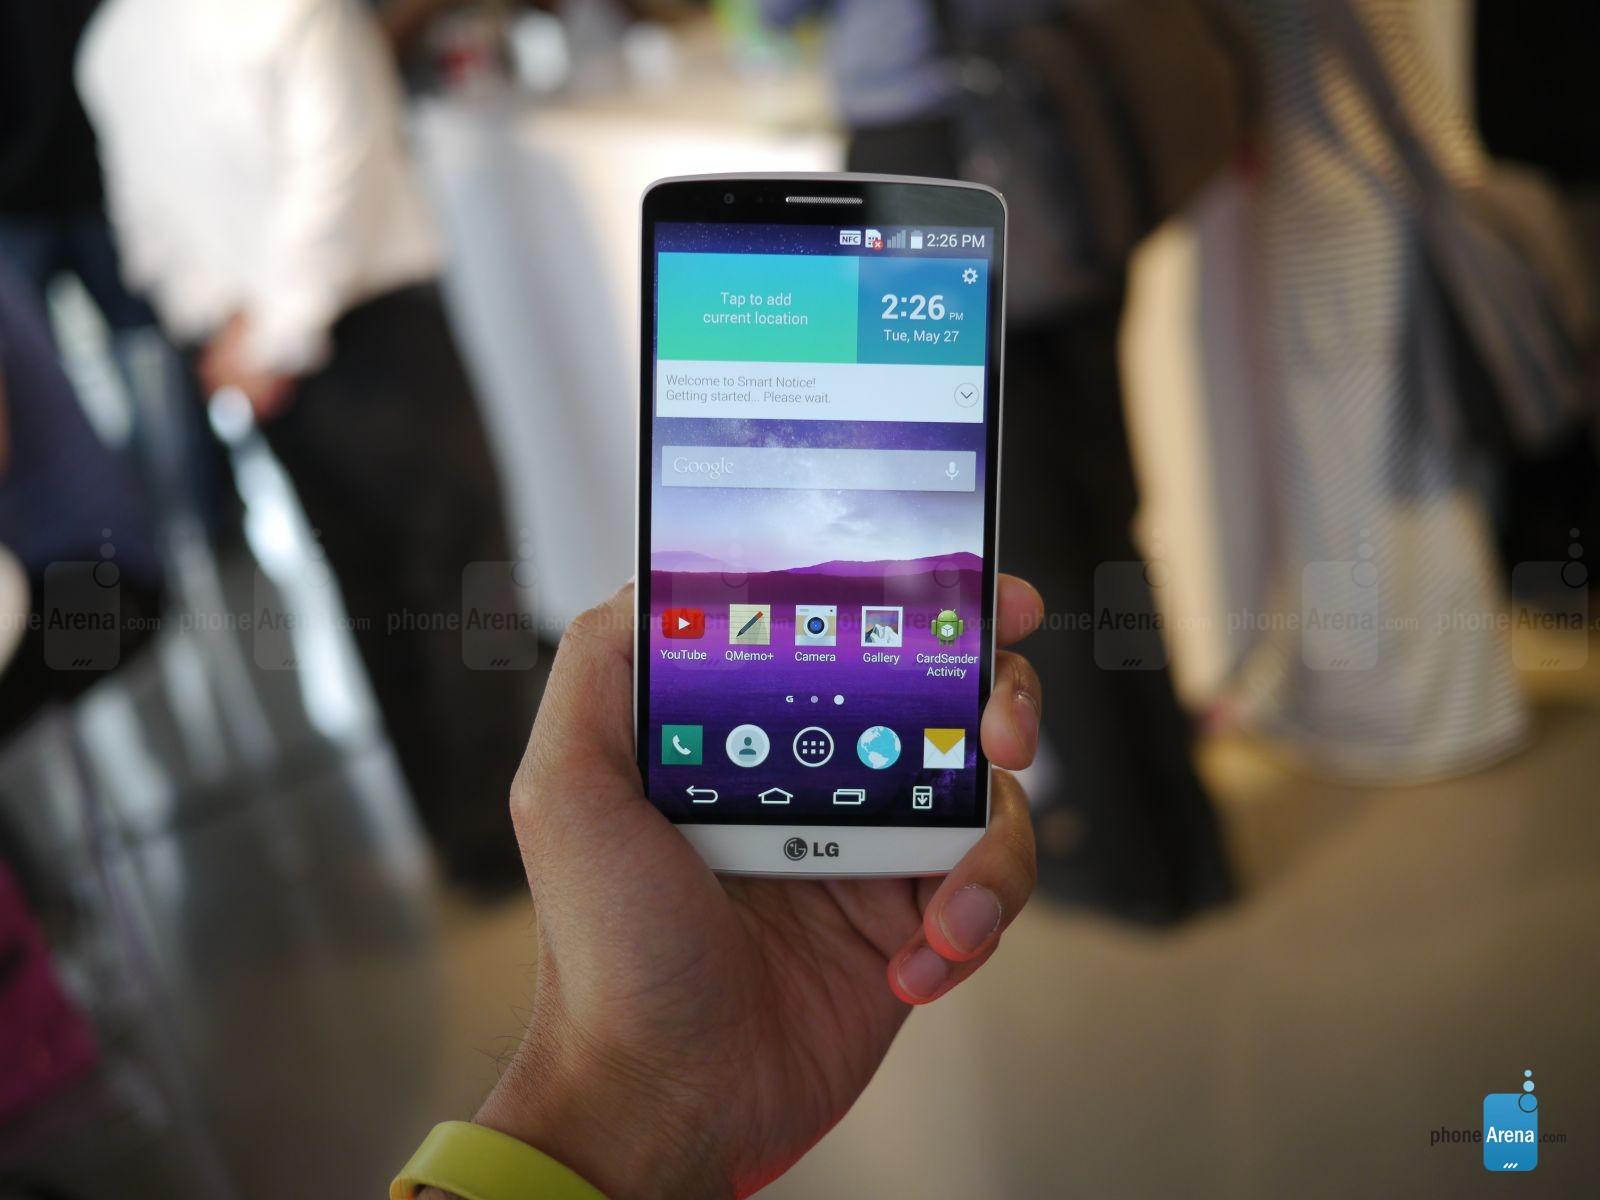 Hands-On LG G3 ในงานเปิดตัวจากเว็บไซต์ต่างประเทศ